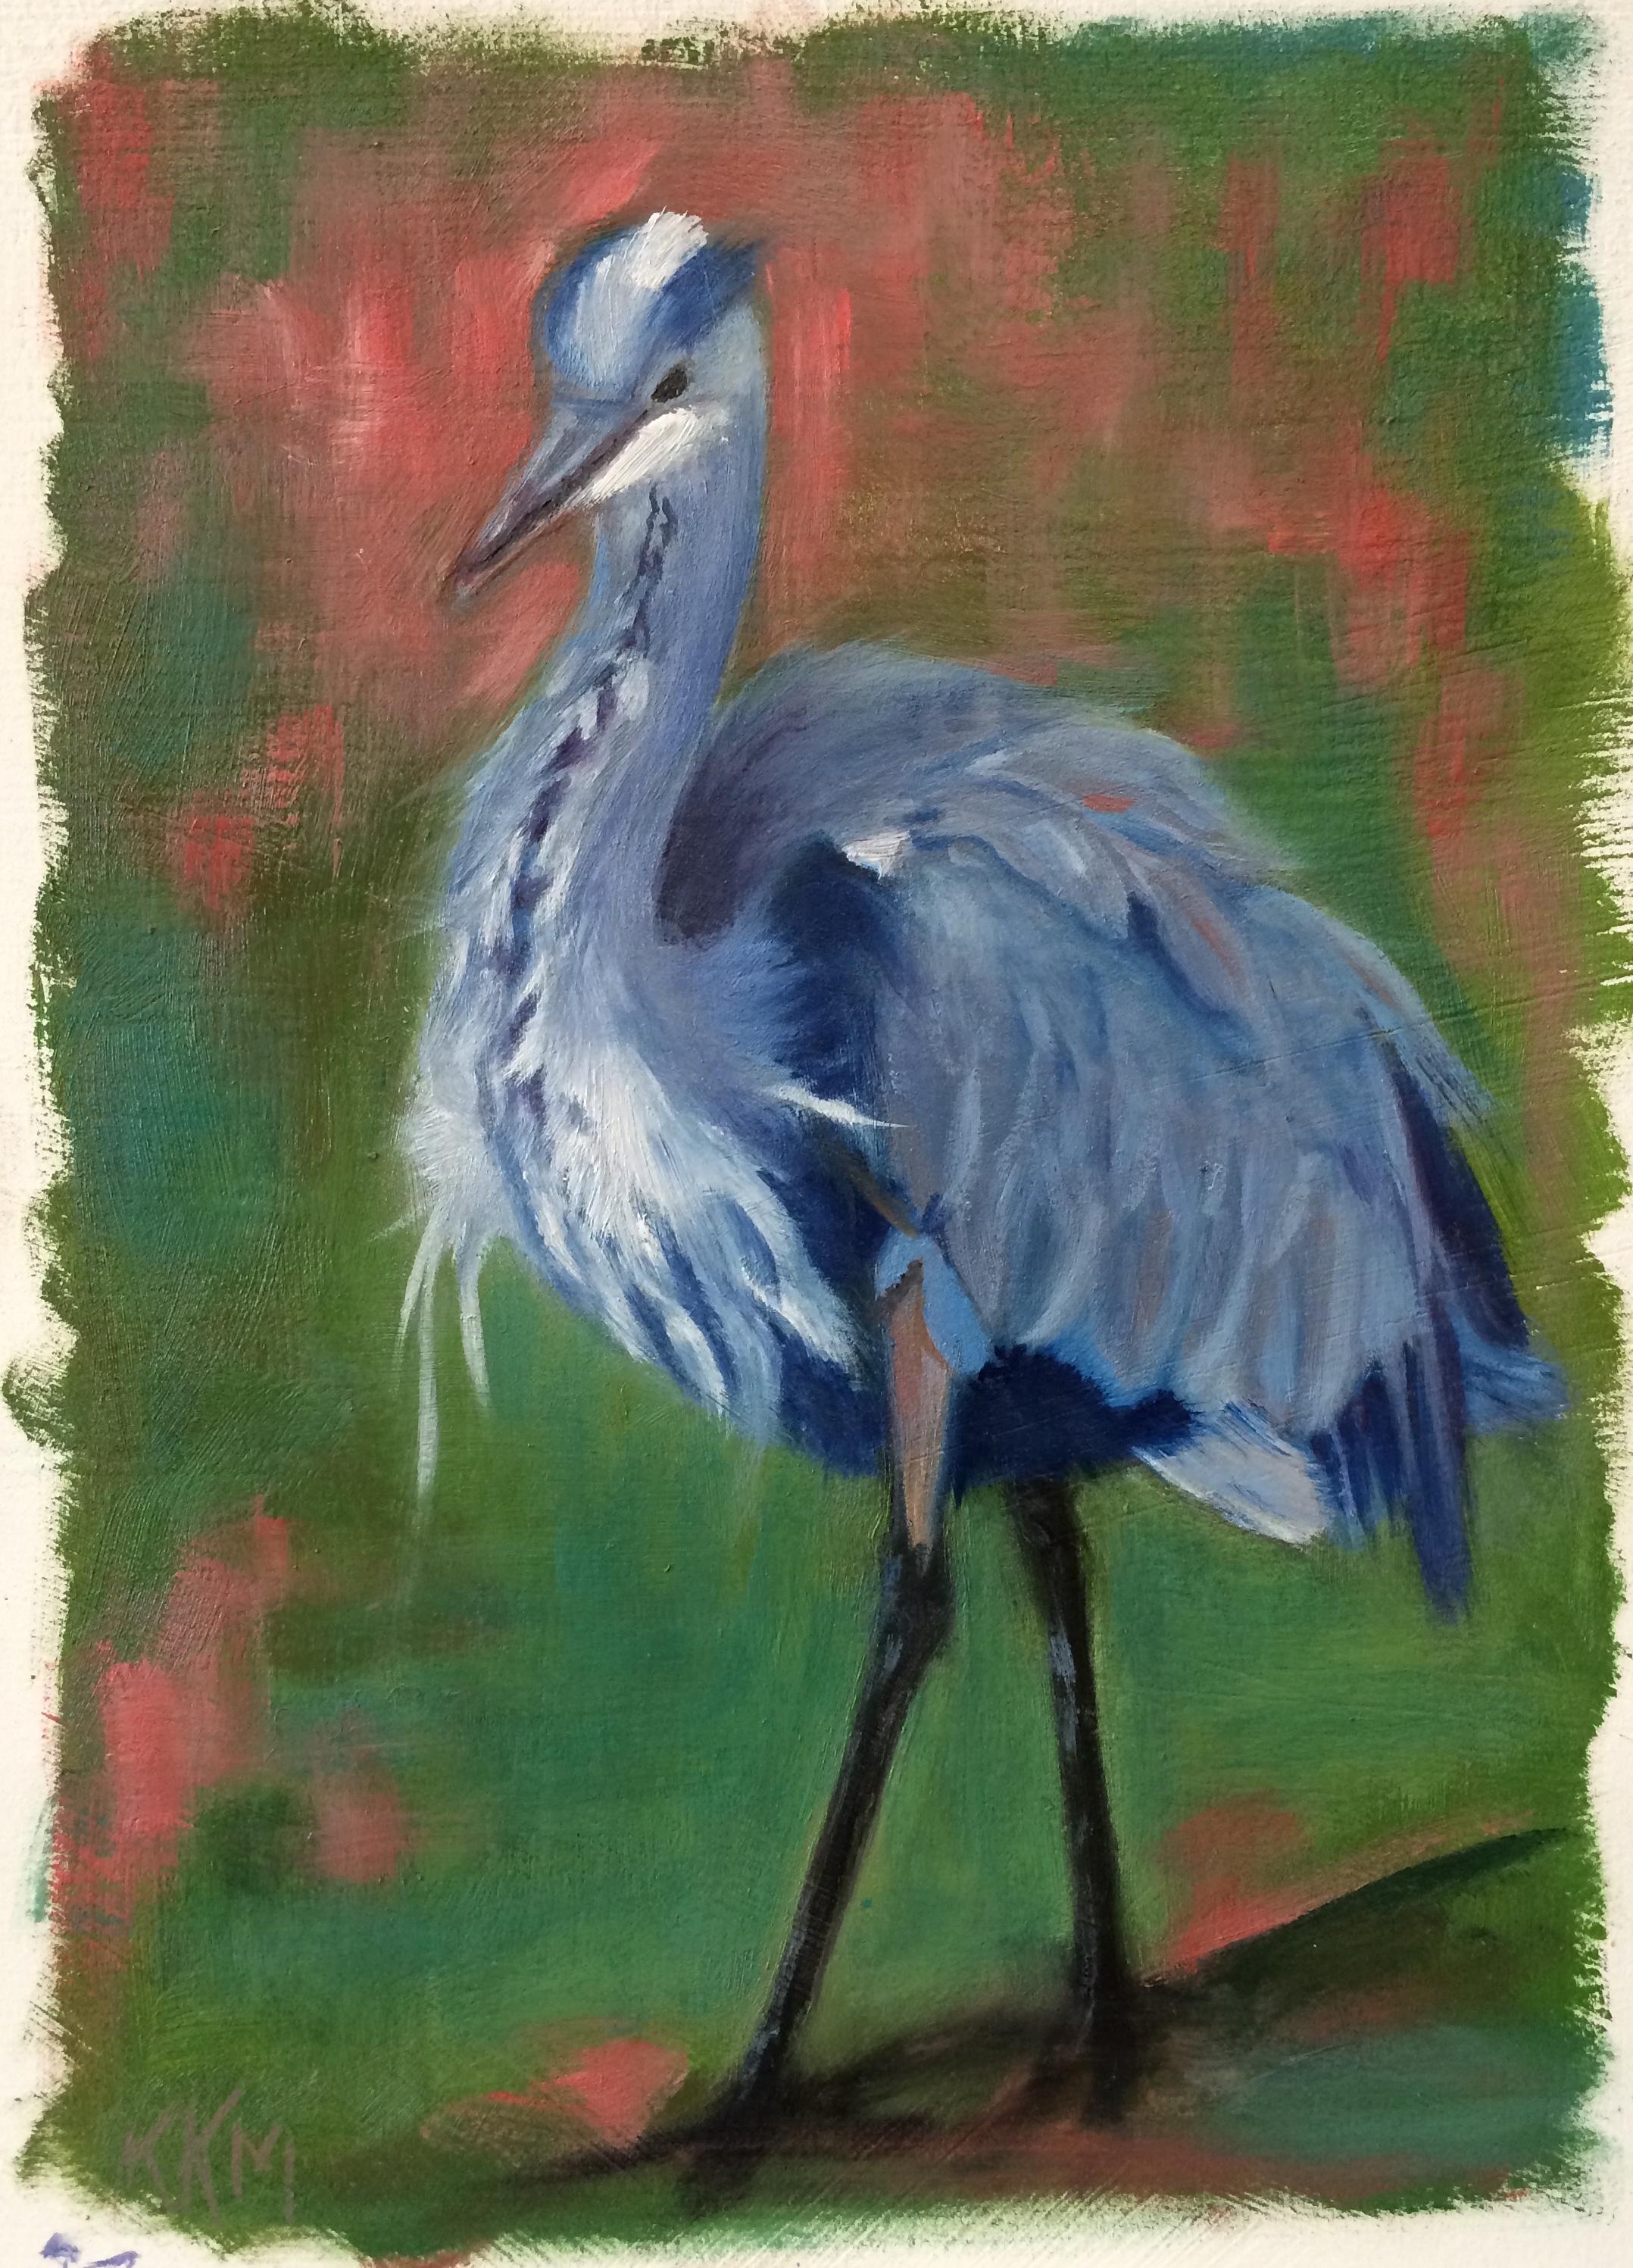 Blue Heron Paintings For Sale